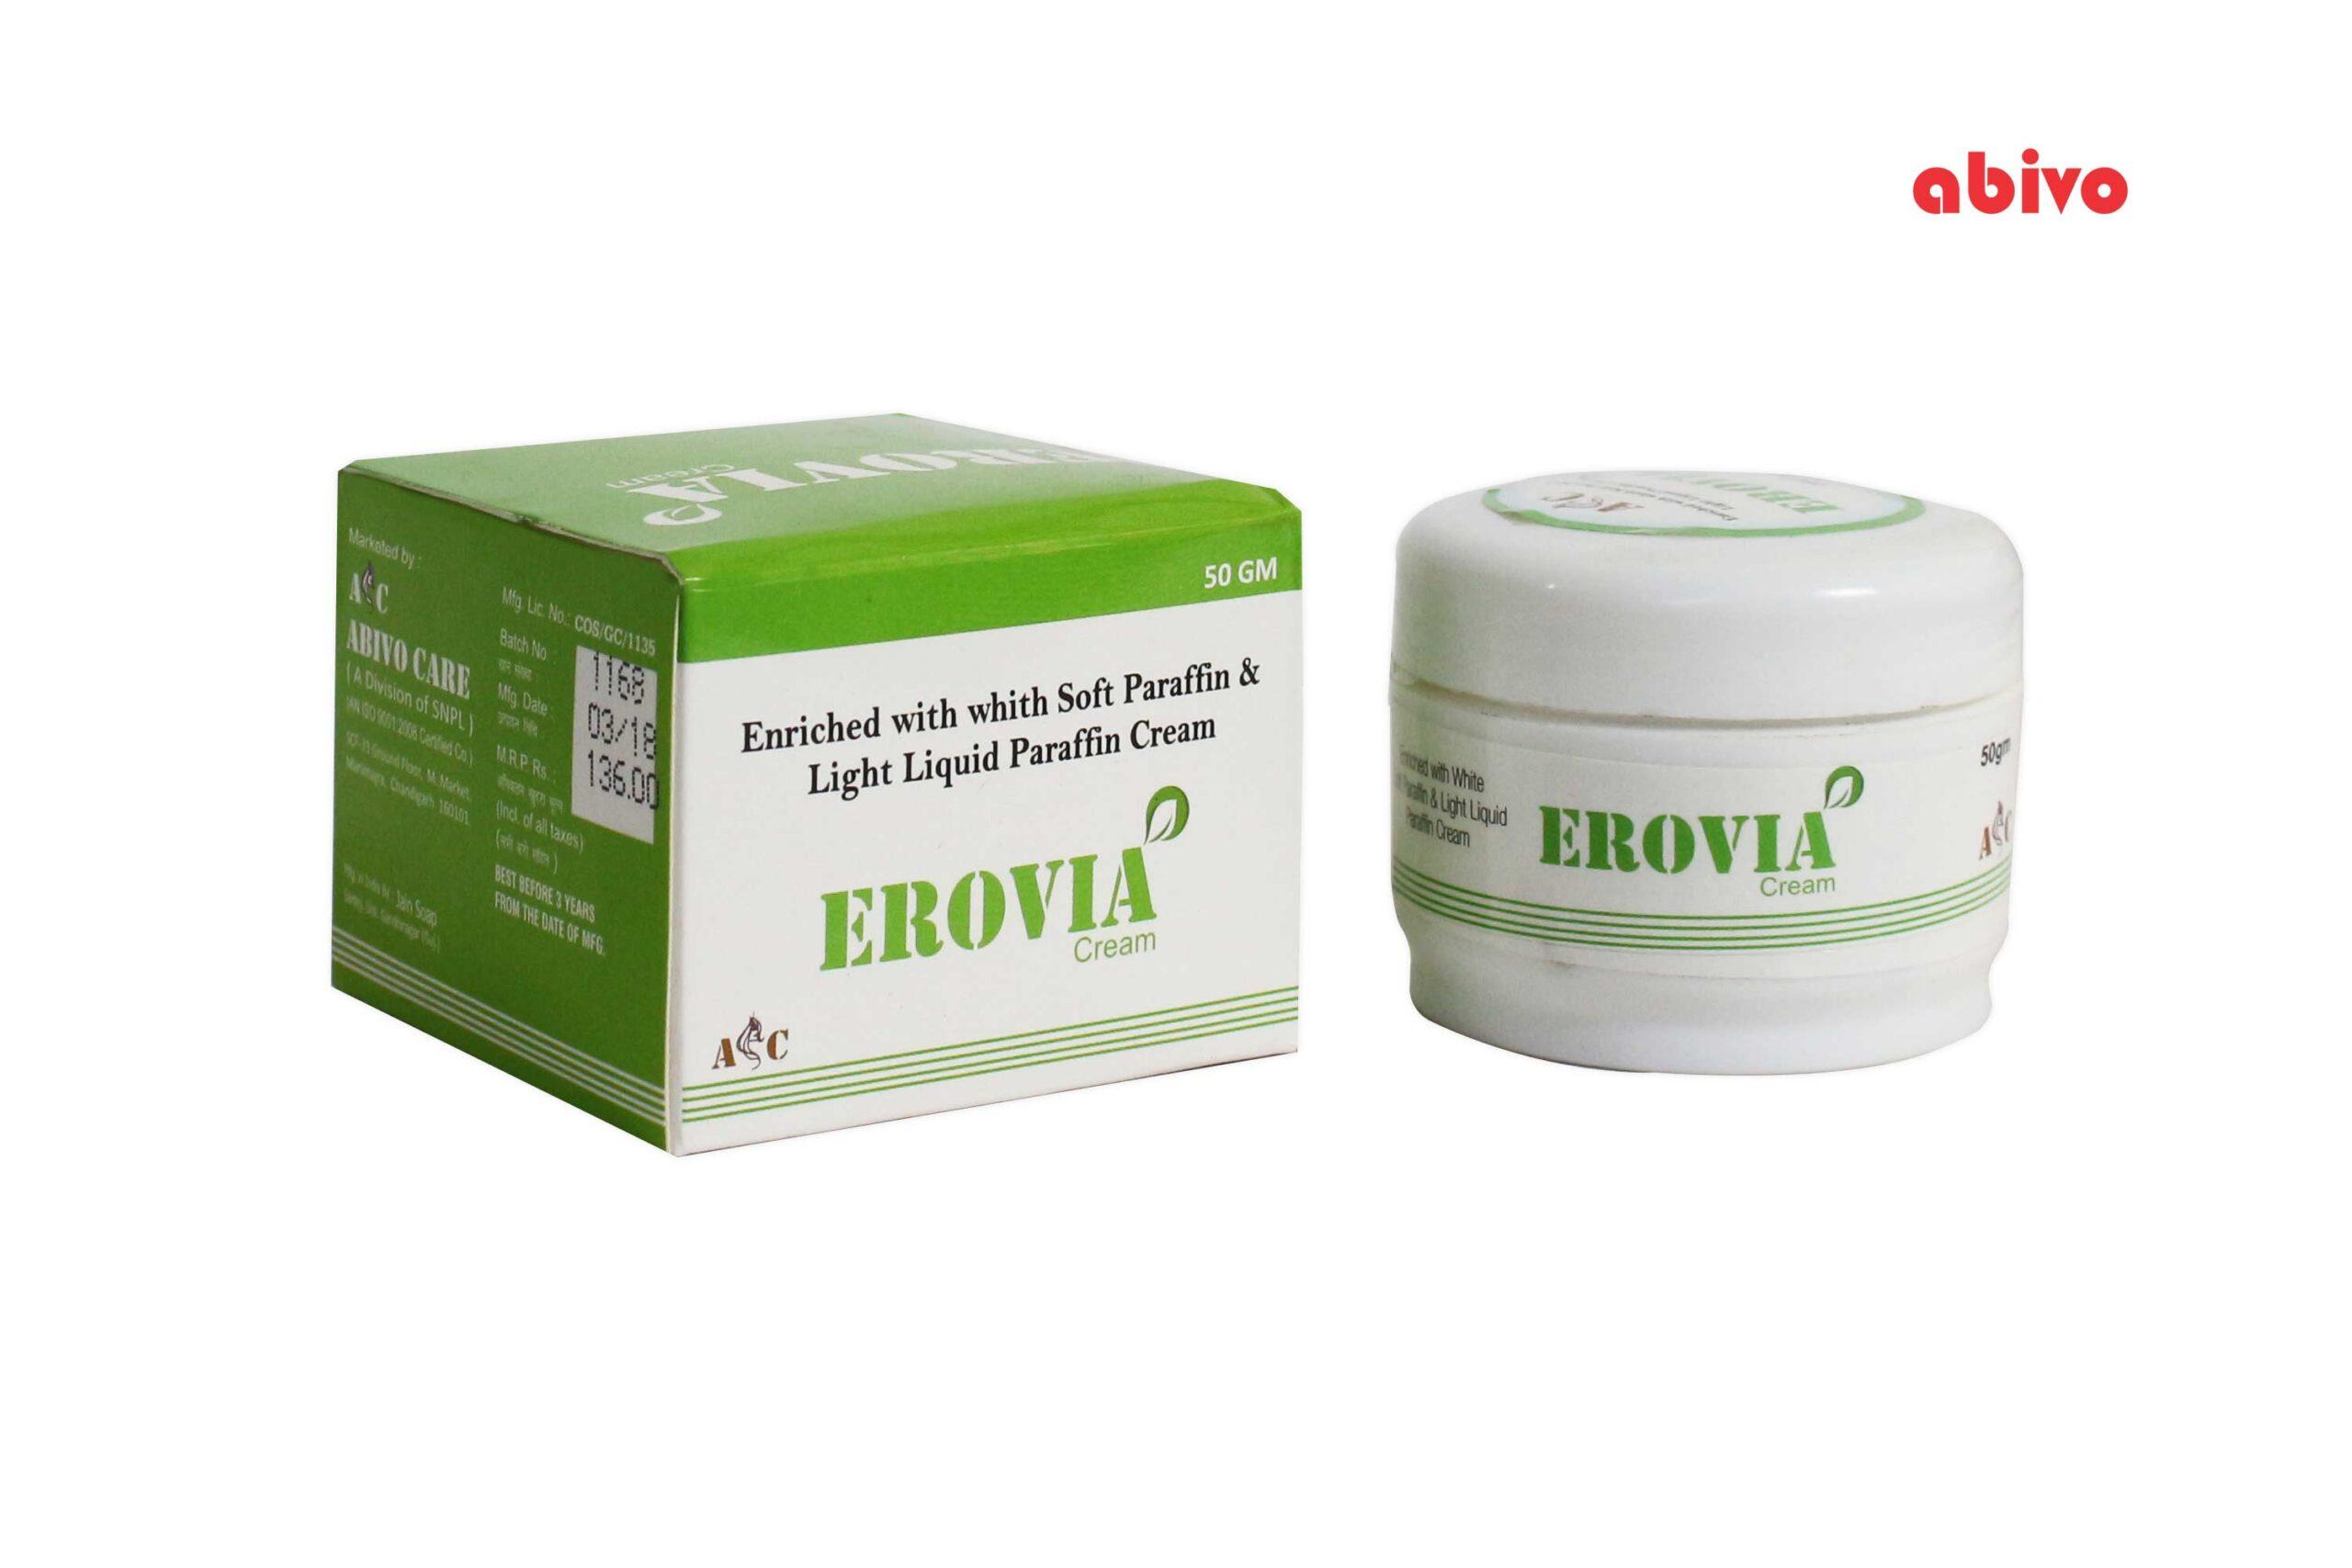 Erovia